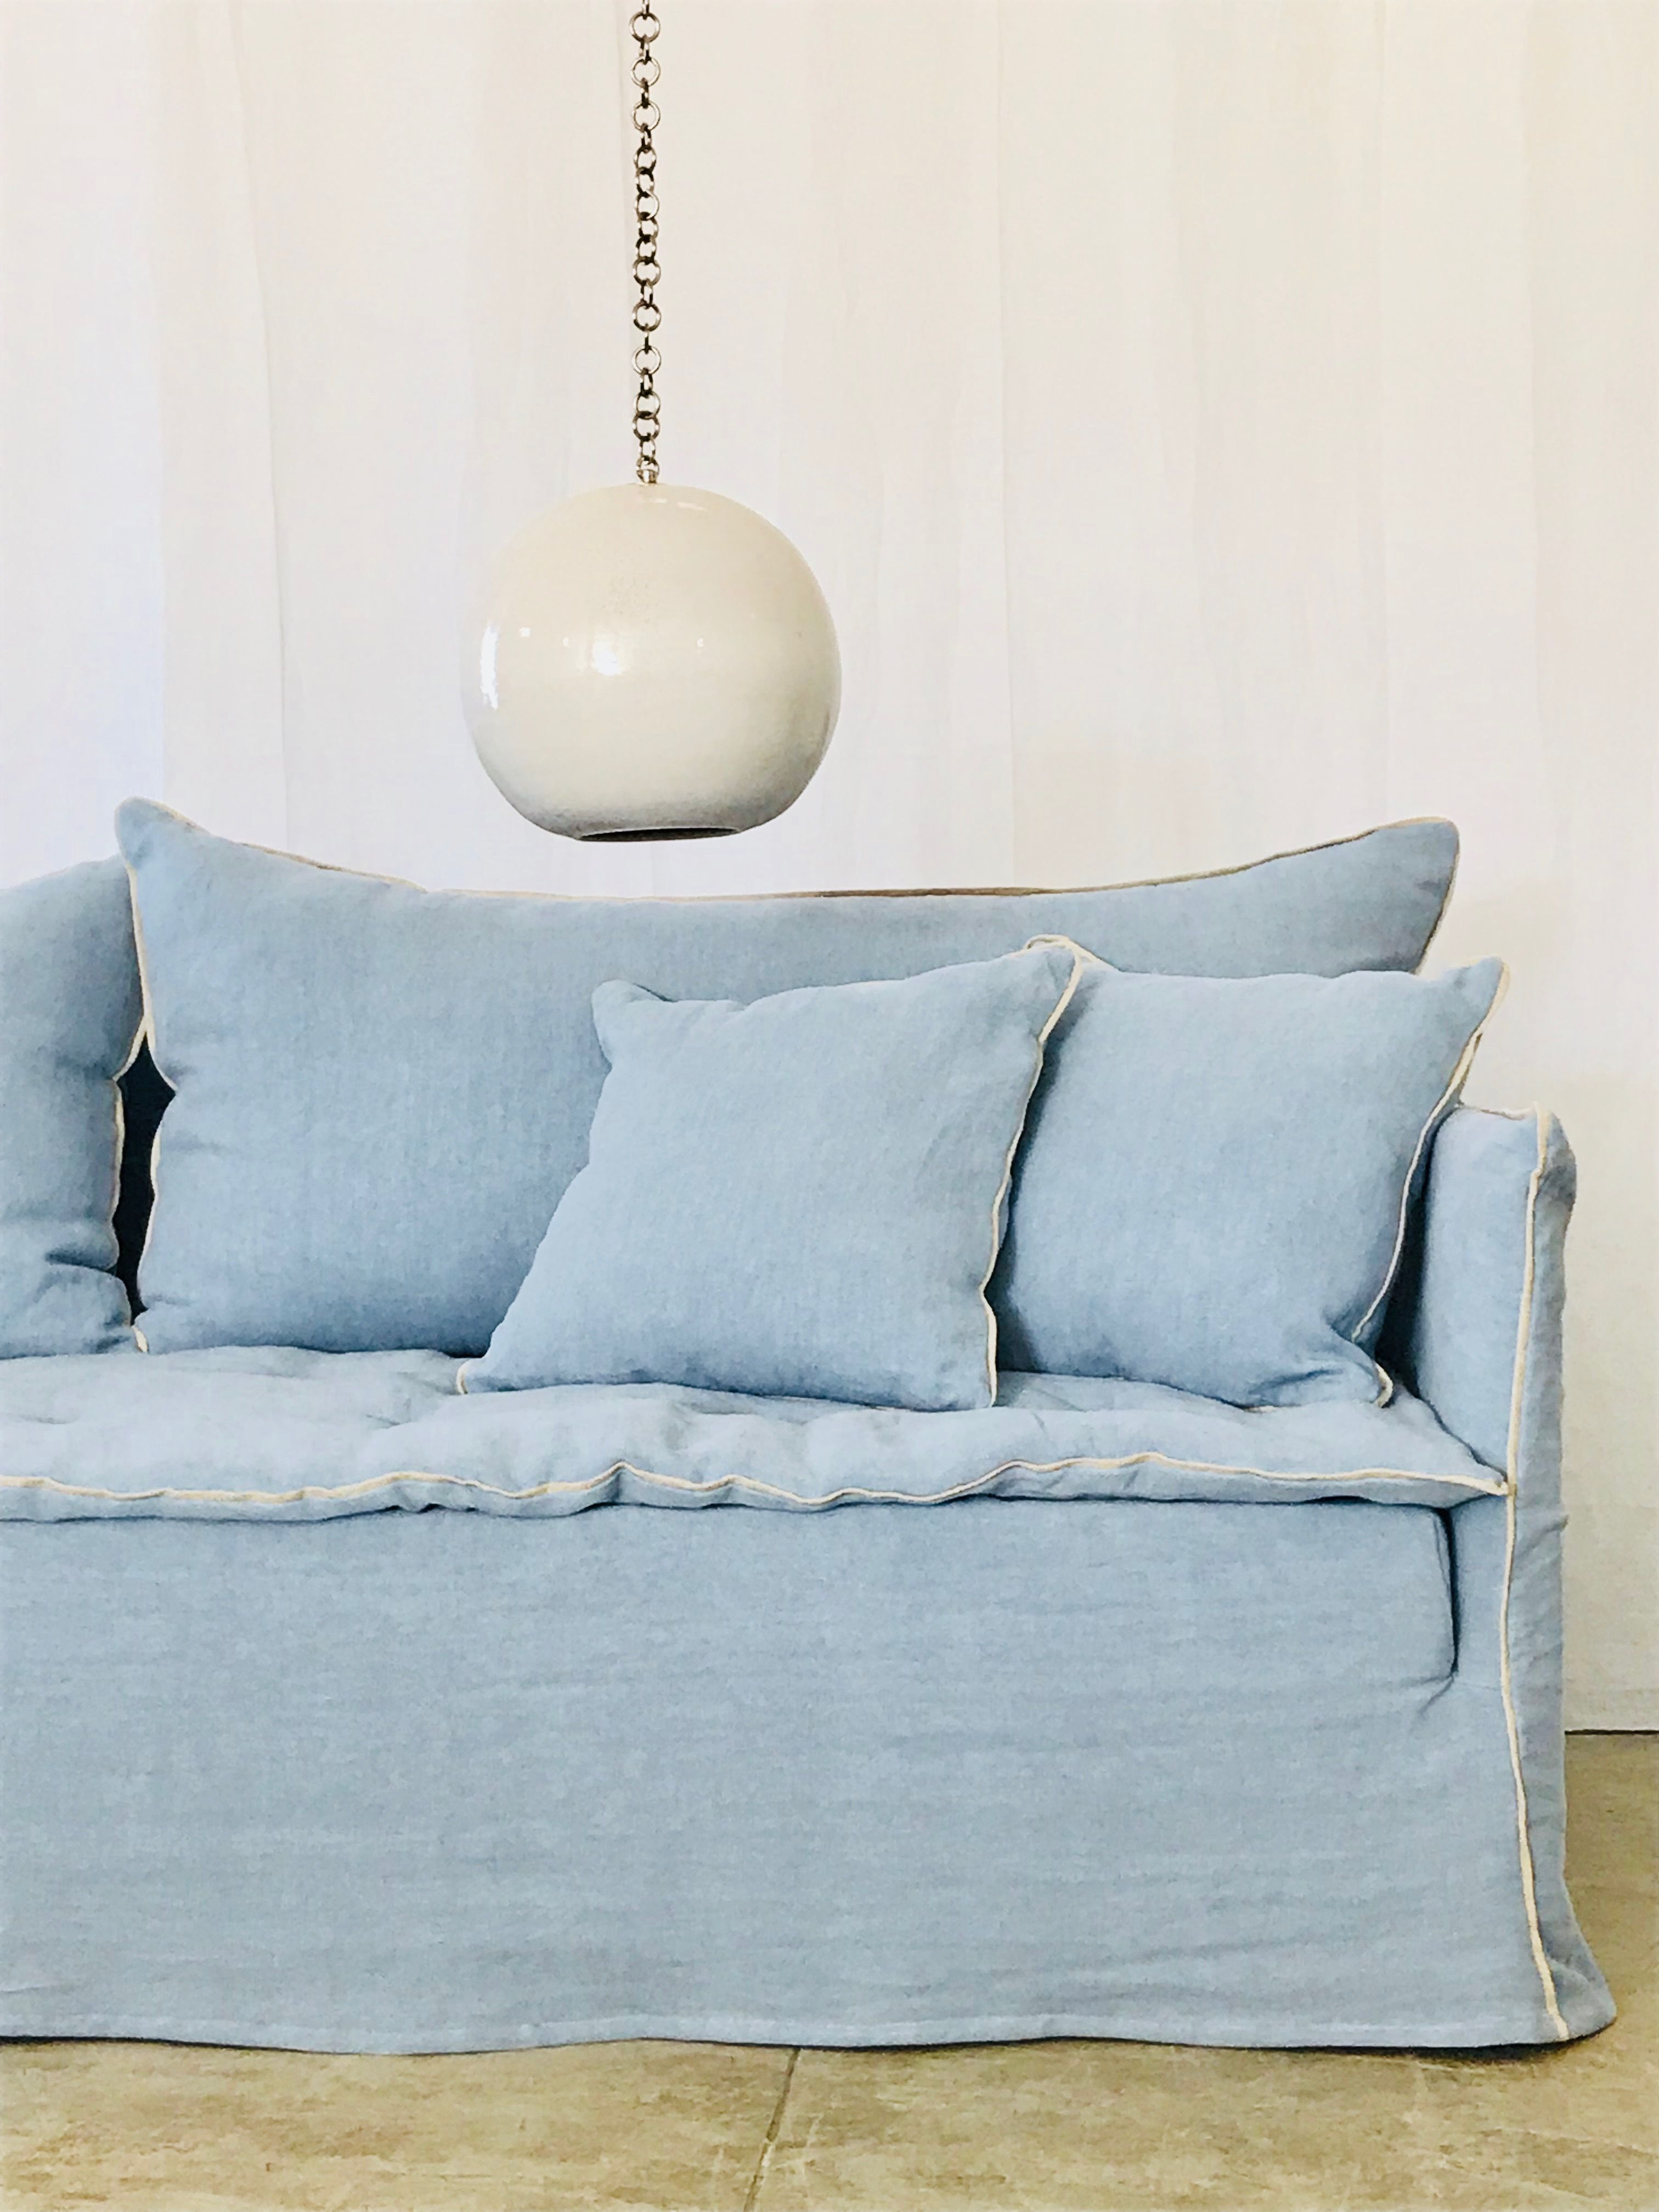 Canapé Convertible Bleu Turquoise Impressionnant Photos Article with Tag Canape Sur Mesure Angle